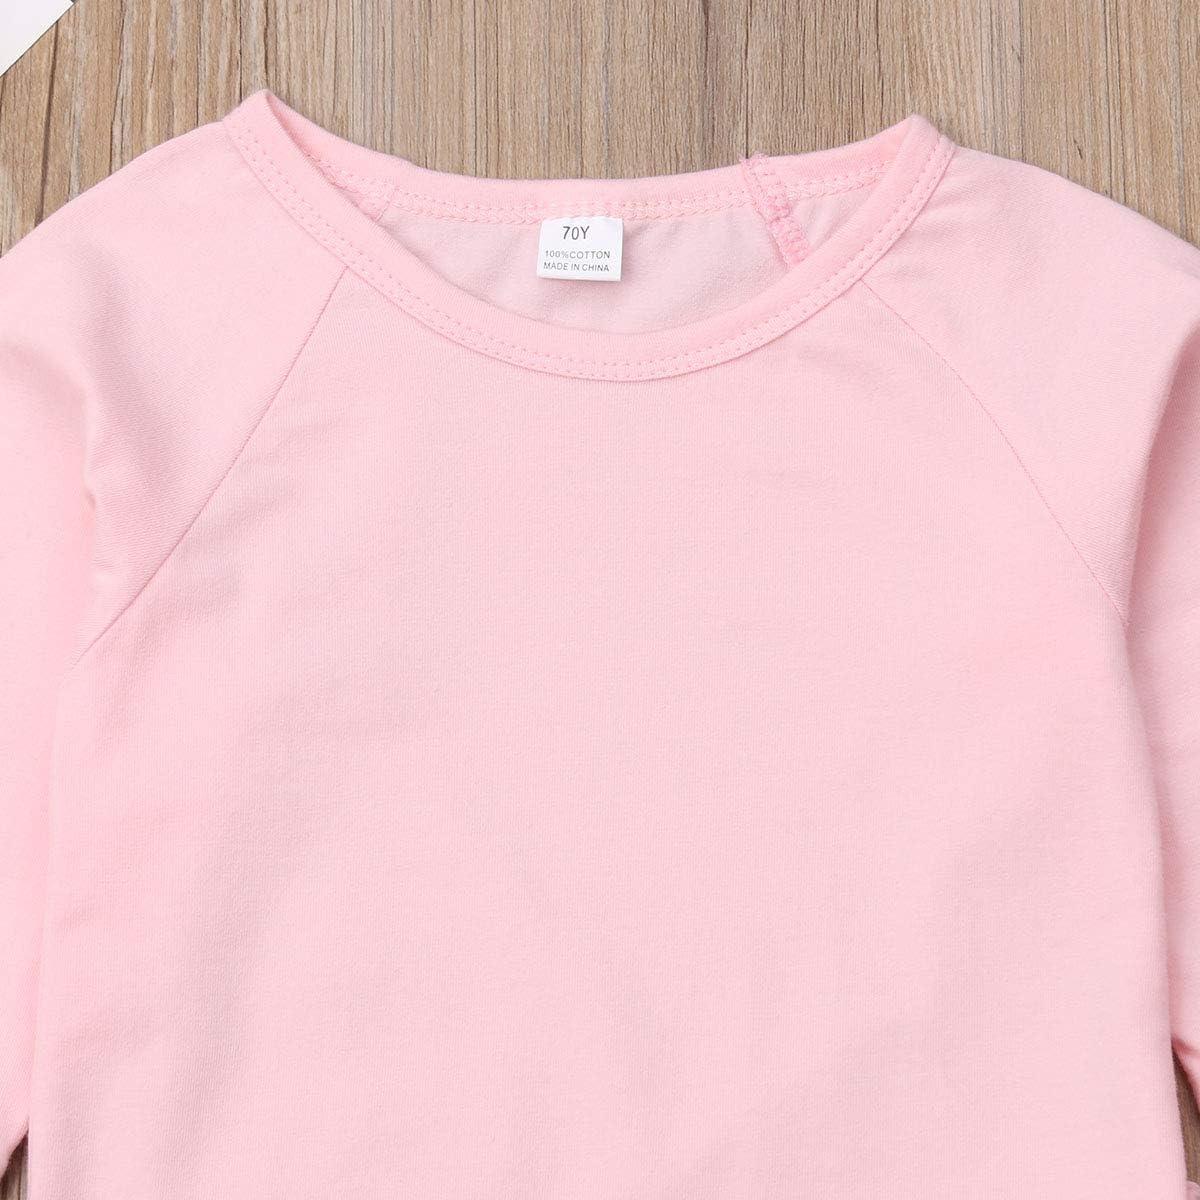 ITFABS Cute Baby Boys Girls Pajamas Set Cotton Solid Pjs Sleepwear Toddler Baby Long Sleeve Sleeper Home Wear